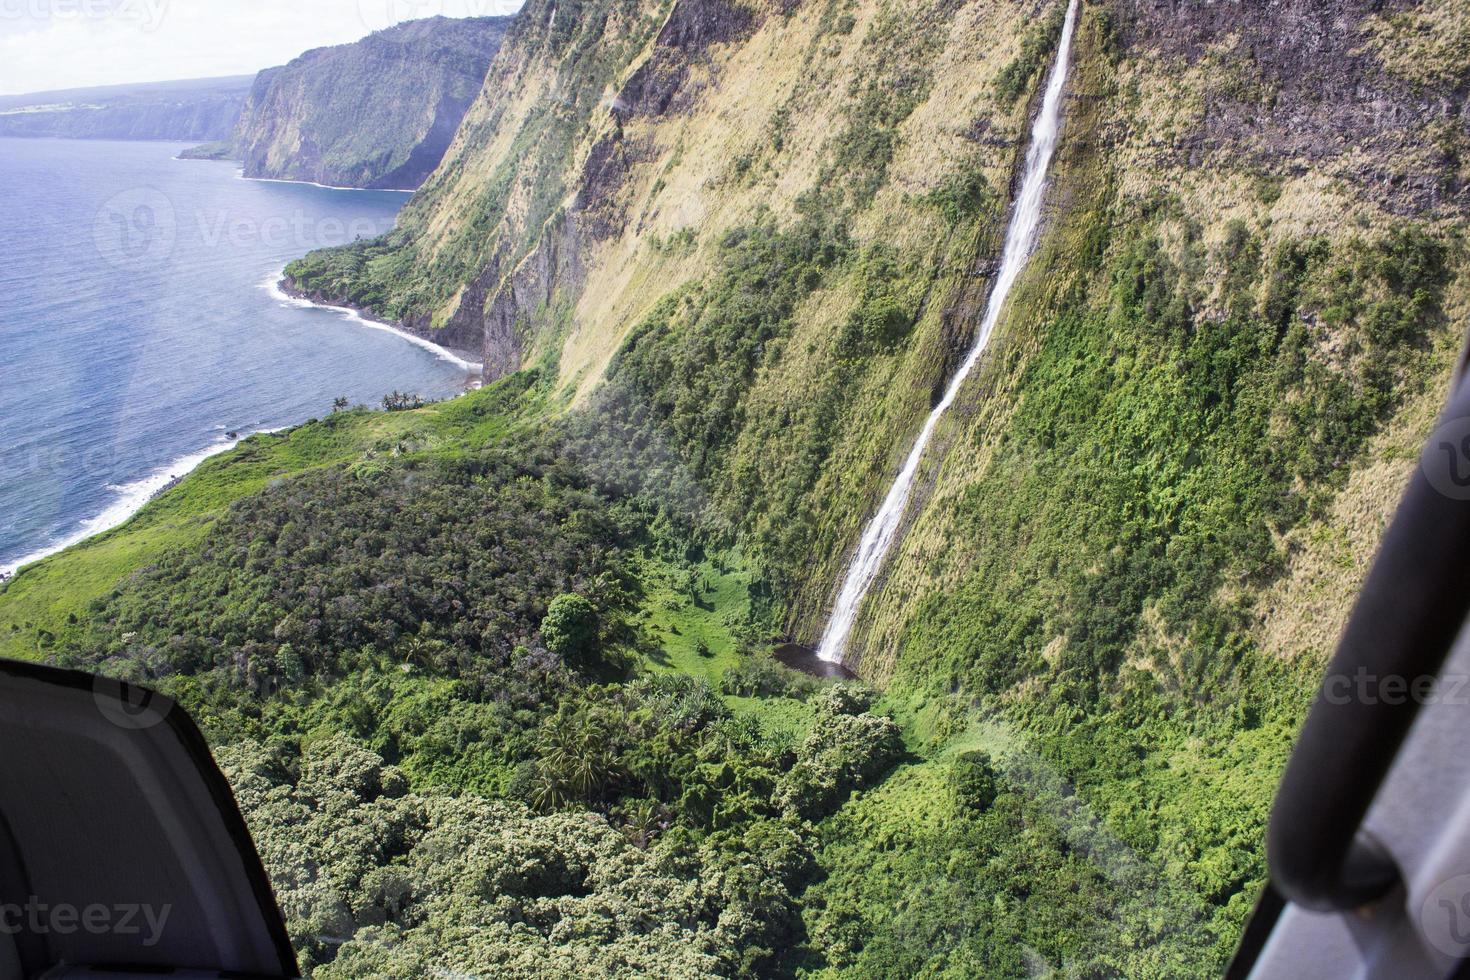 scogliere e cascate costiere in hawaii foto